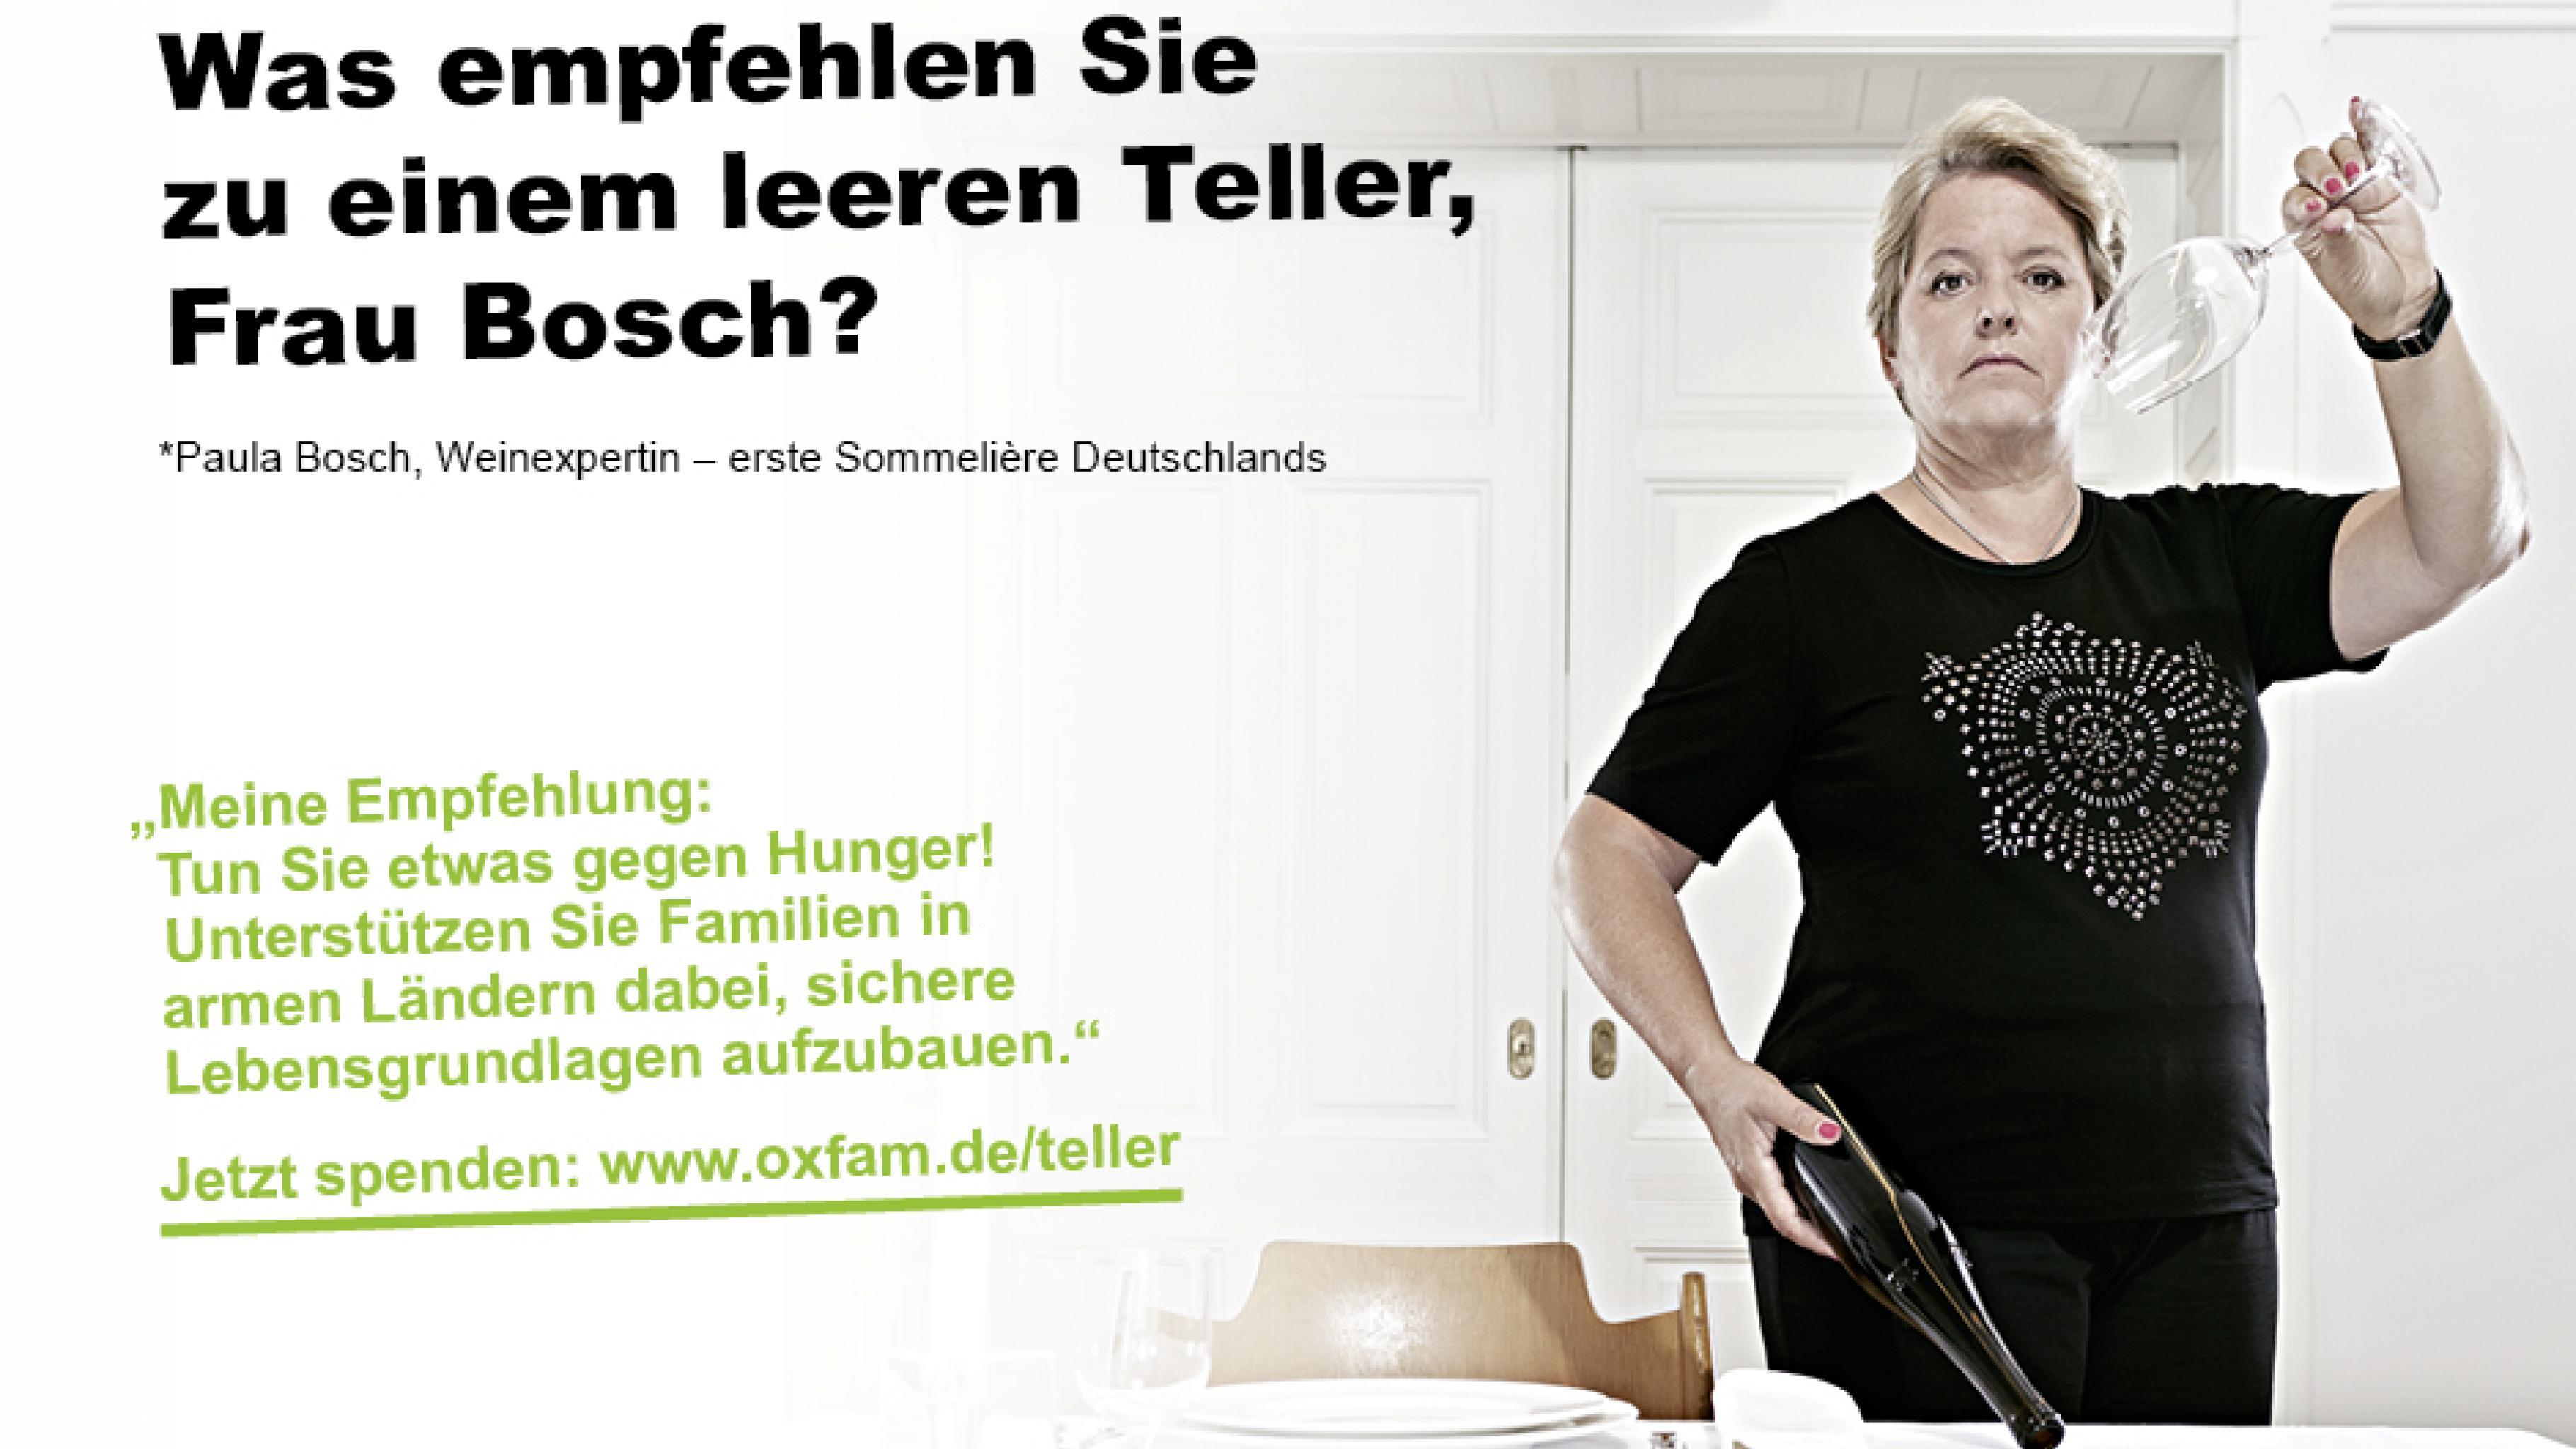 Oxfam leerer Teller Kampagne